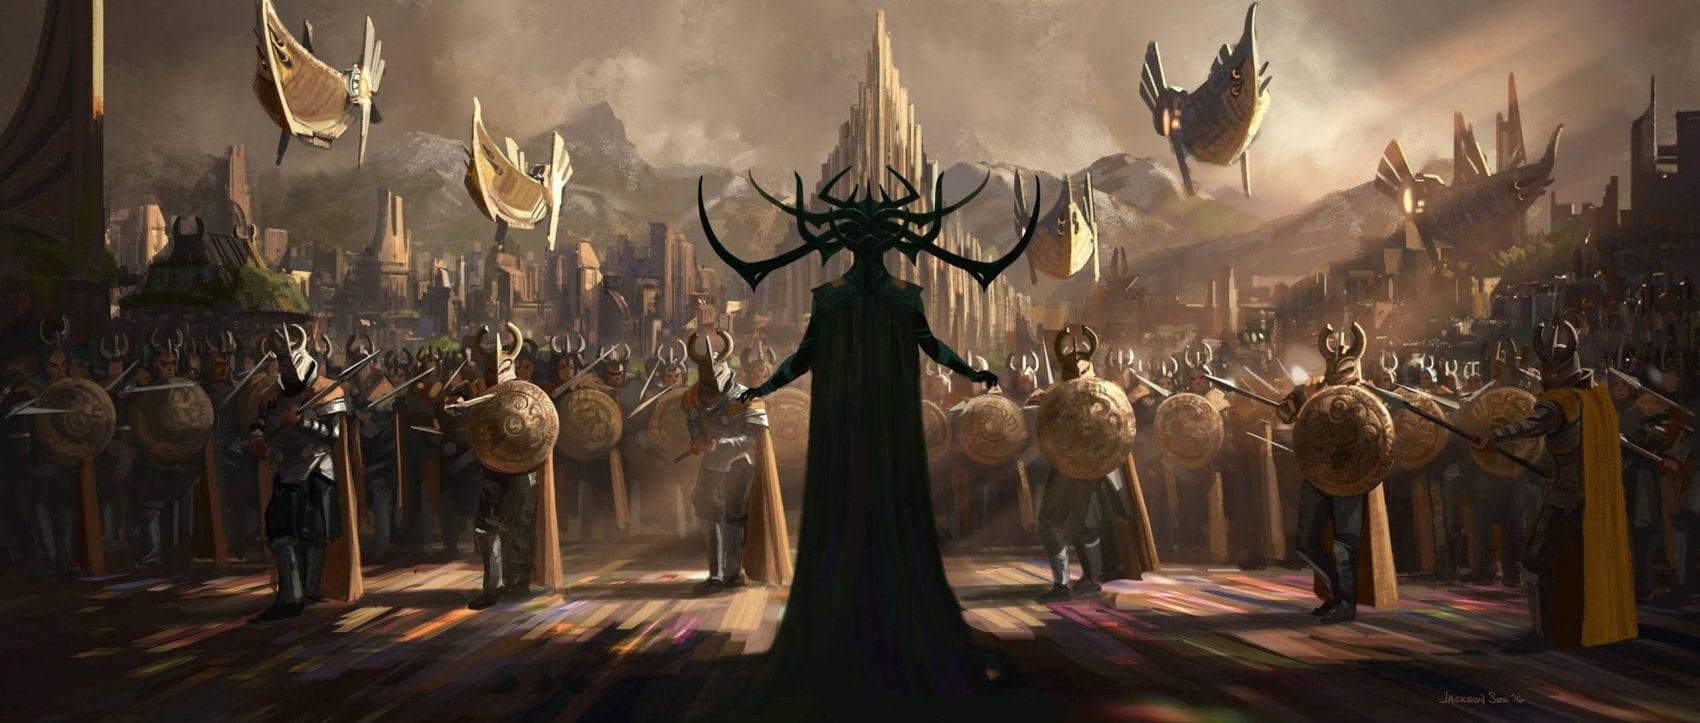 Thor Ragnarok News My Geek Actu Cover